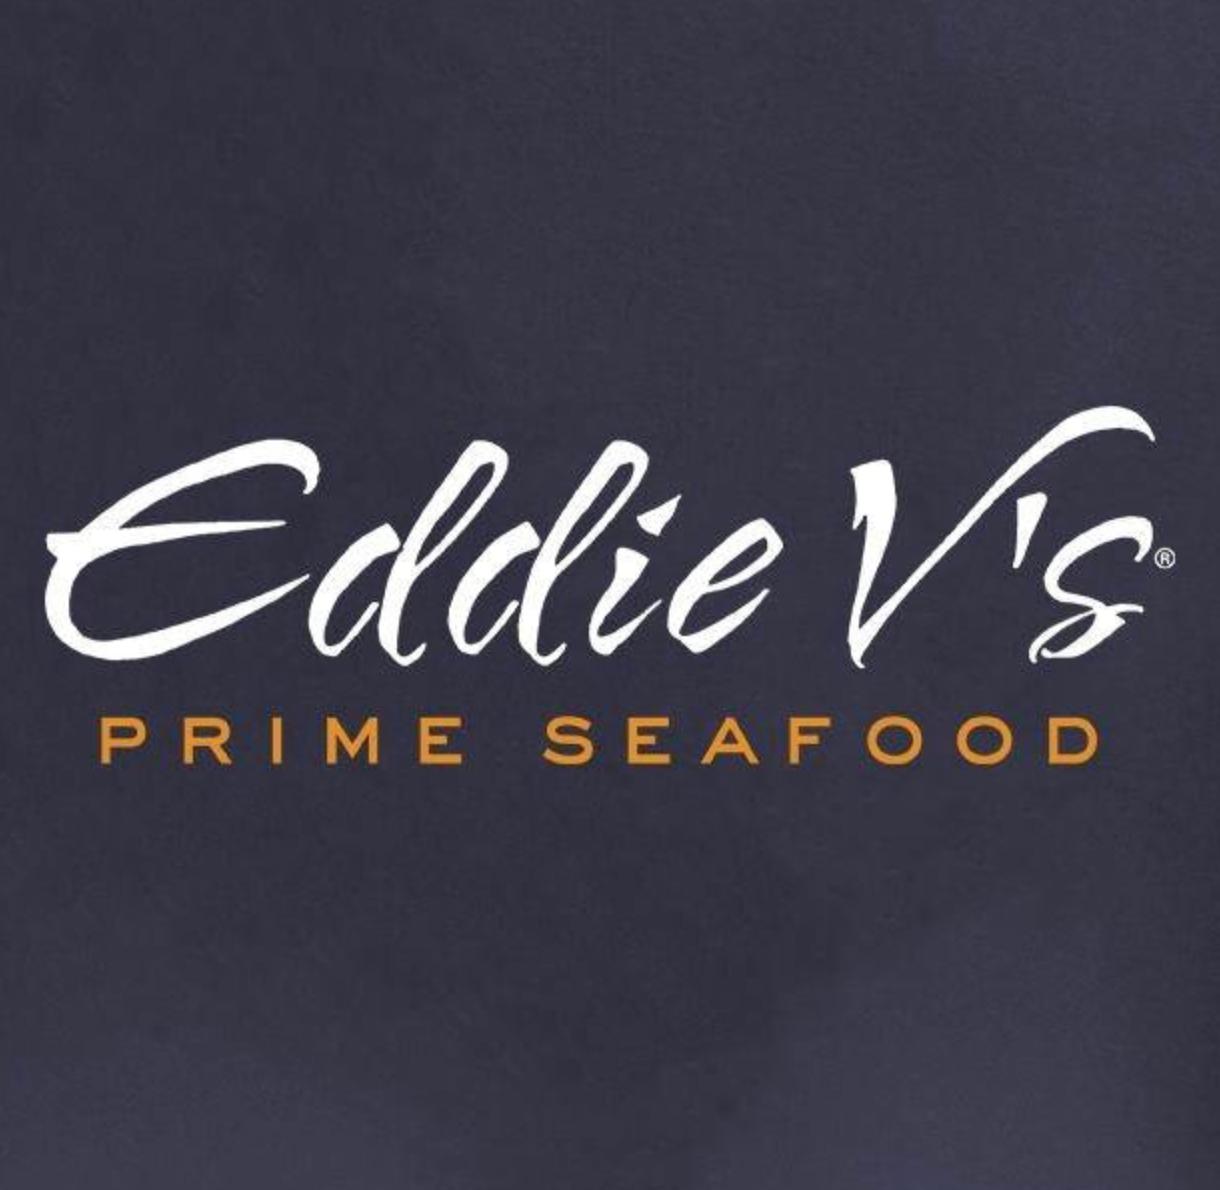 Eddie V's – Wildfish , Dinner  1834 North Loop 1604, San Antonio, 78205  P 210-493-1600    Eddie V's Dinner Menu      Make a Reservation on OpenTable